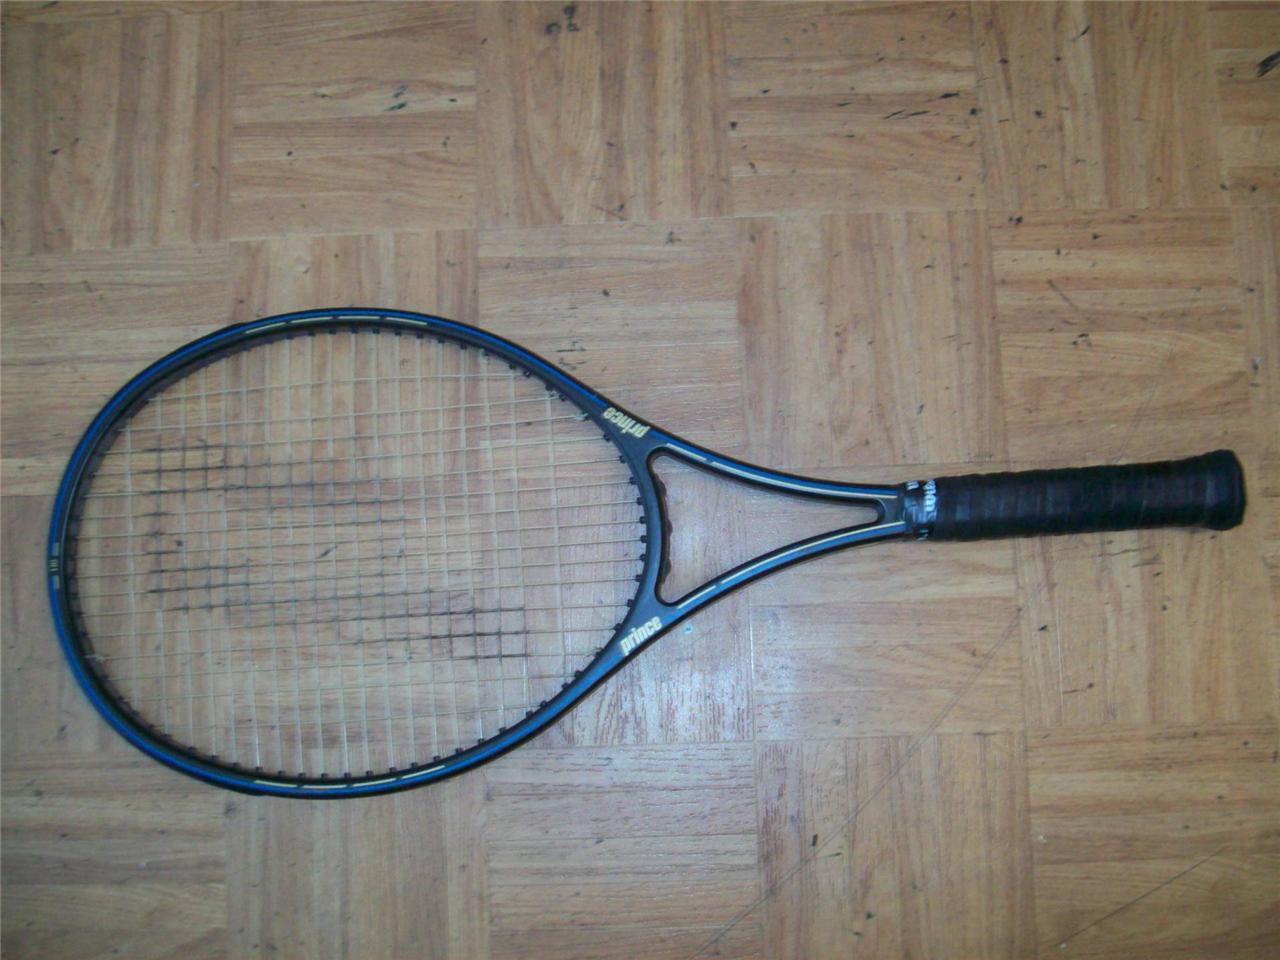 Prince Graphite Supreme 110 4 1 2 grip Tennis Racquet